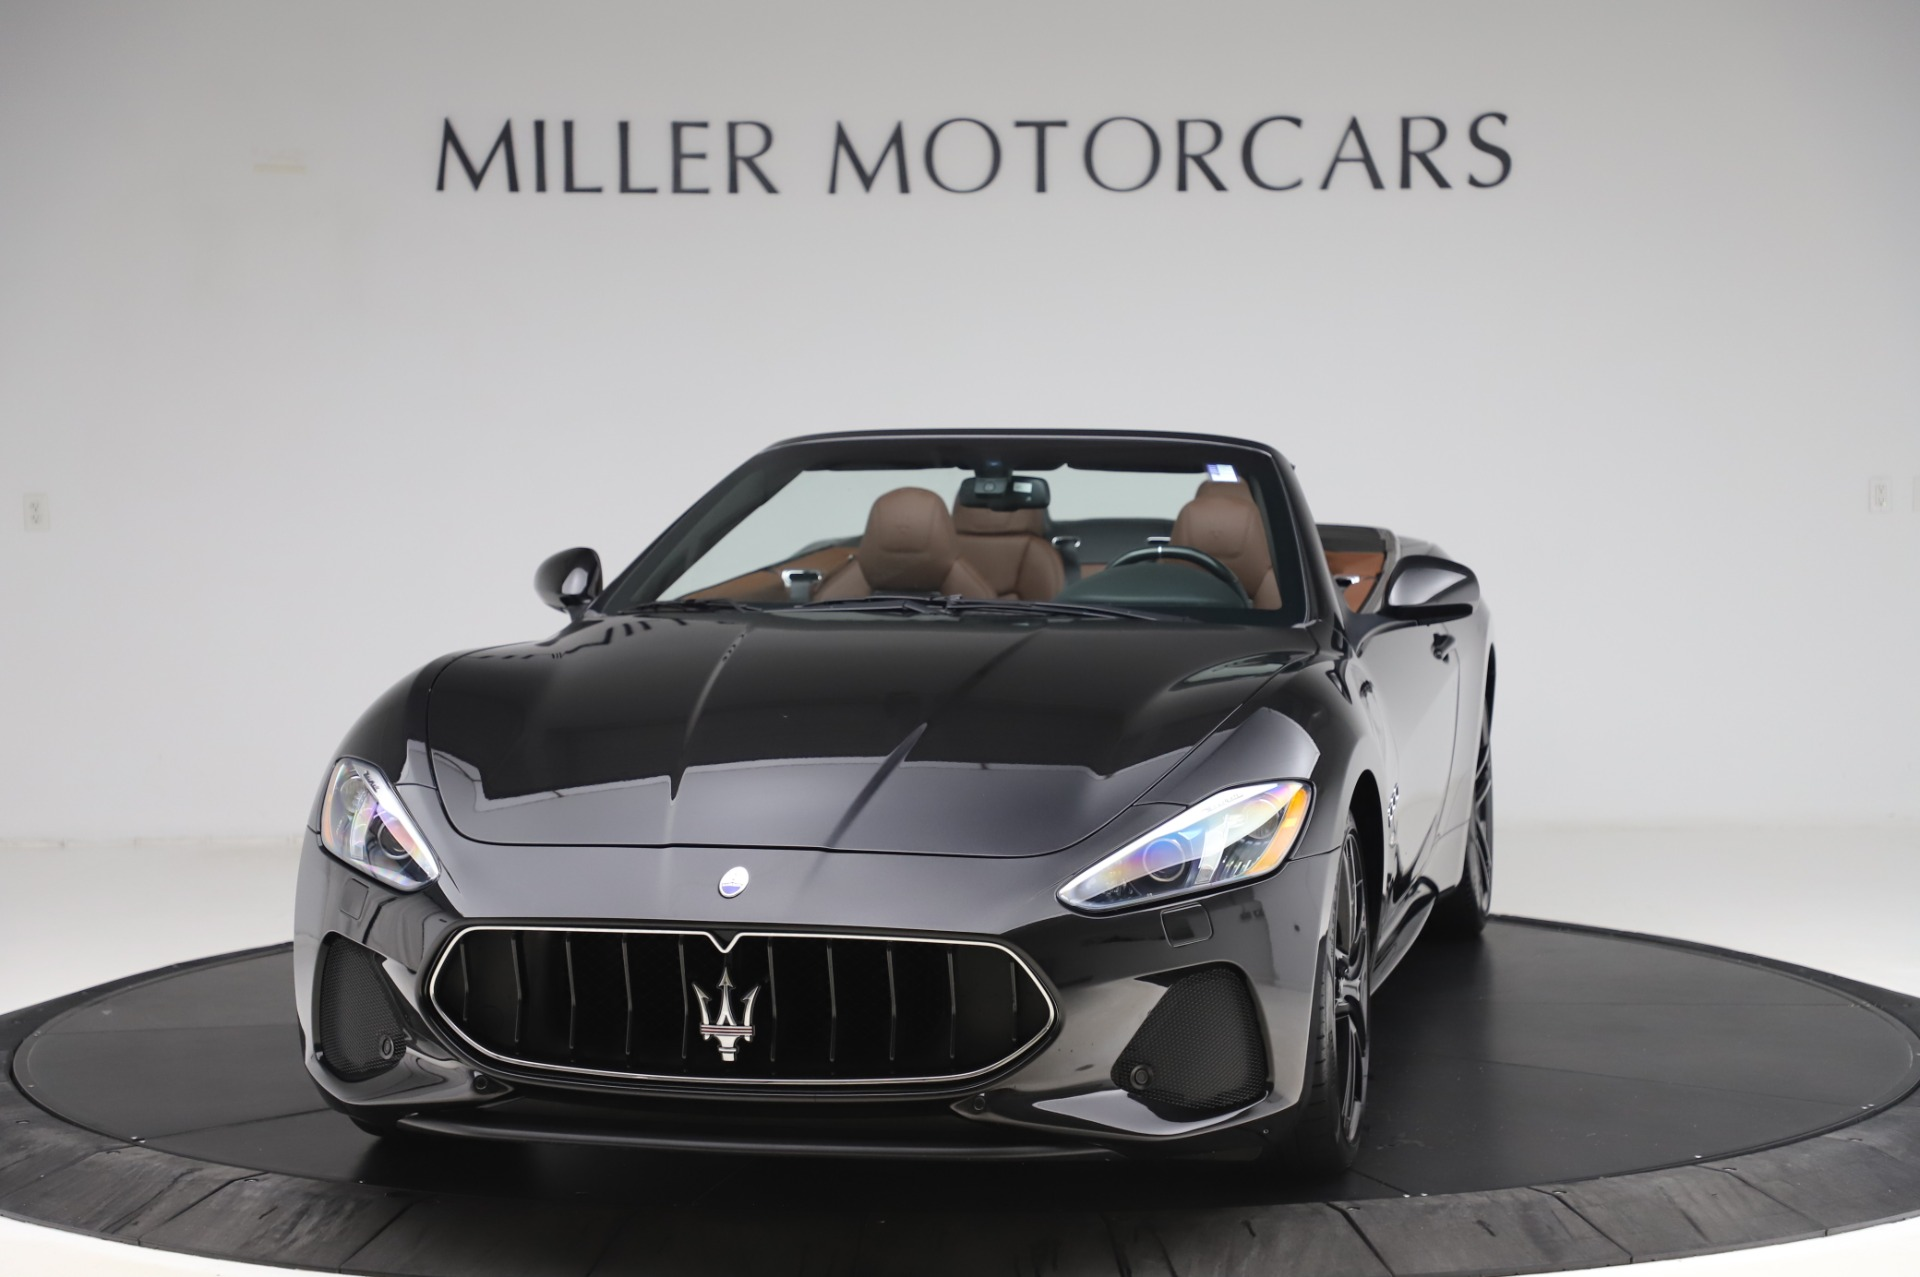 New 2019 Maserati GranTurismo Sport for sale $163,495 at Bentley Greenwich in Greenwich CT 06830 1